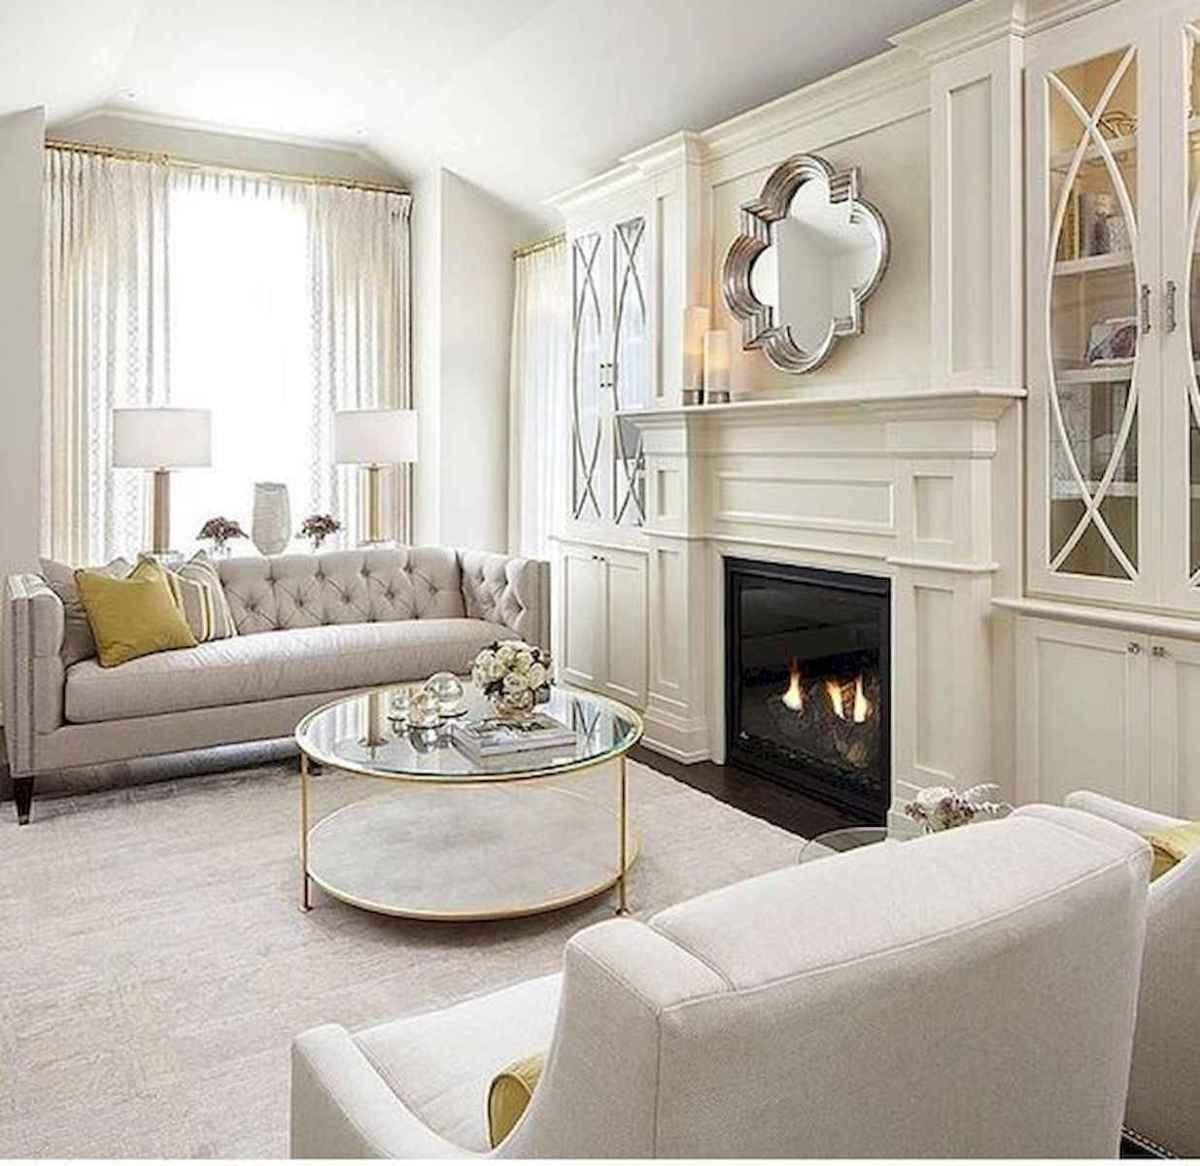 40 Awesome Fireplace Makeover For Farmhouse Home Decor (11)